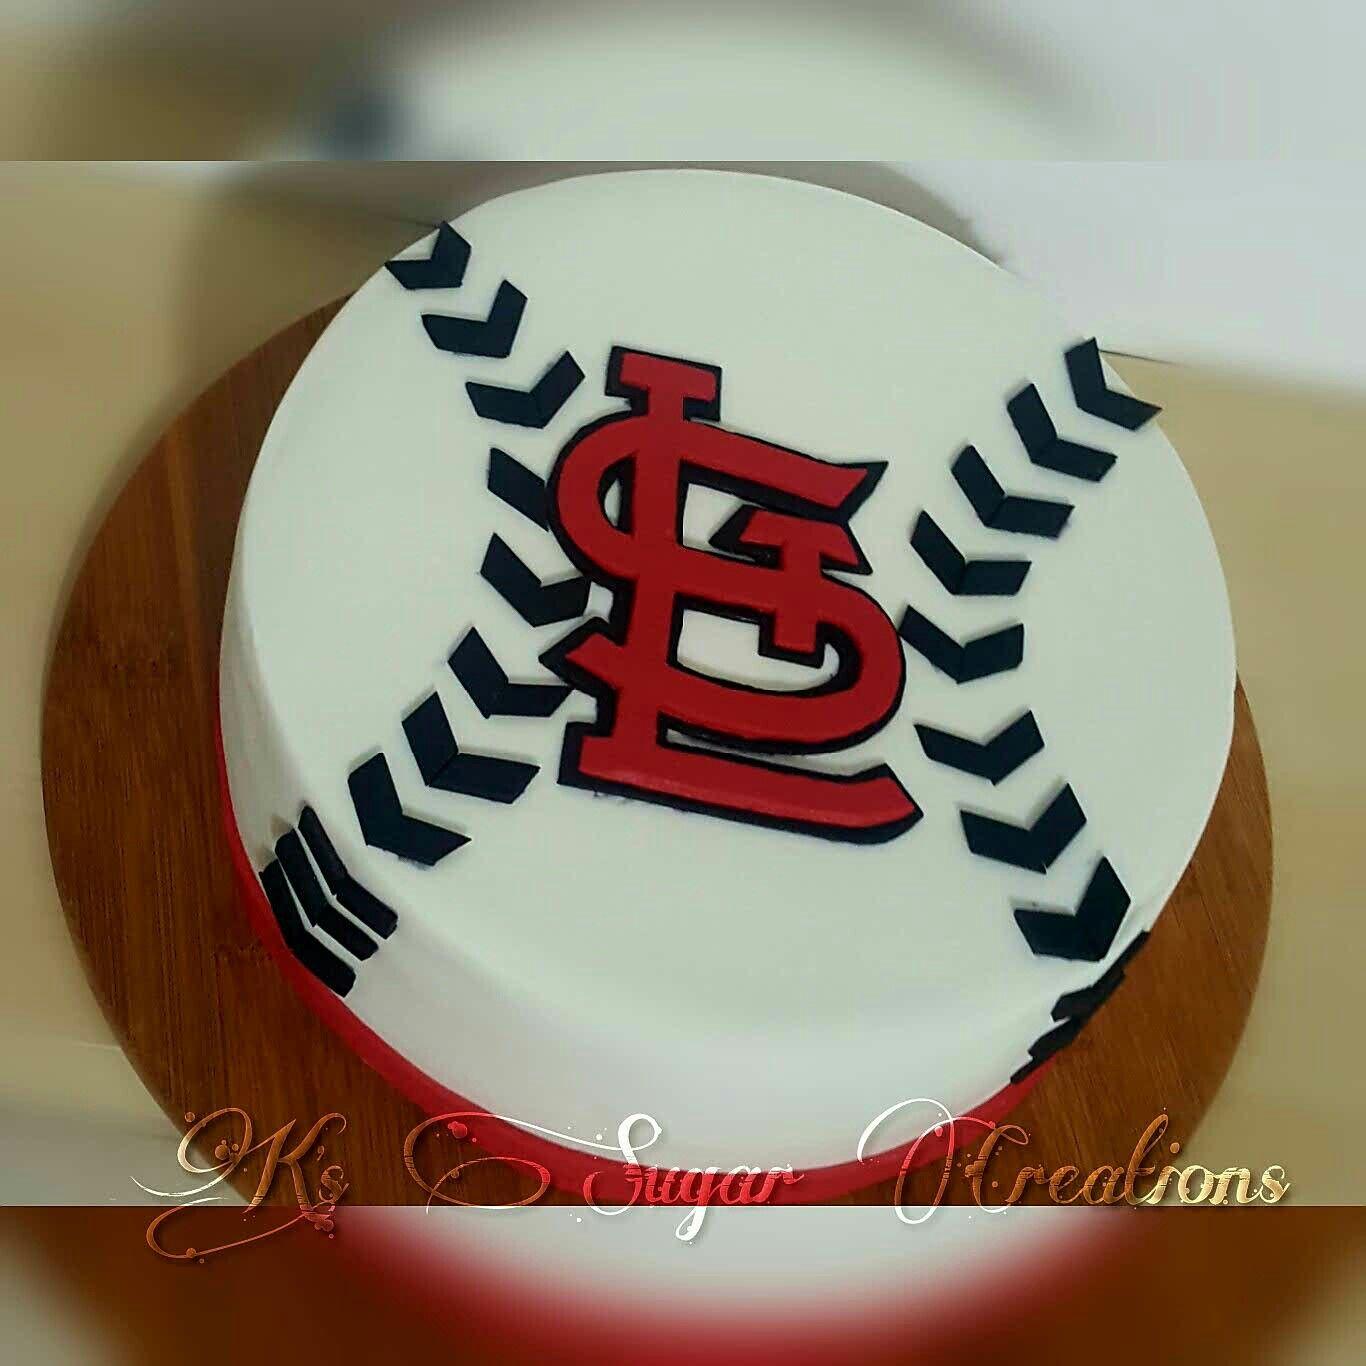 Astounding Saint Louis Cardinals Baseball Cake Baseball Birthday Cakes Funny Birthday Cards Online Alyptdamsfinfo